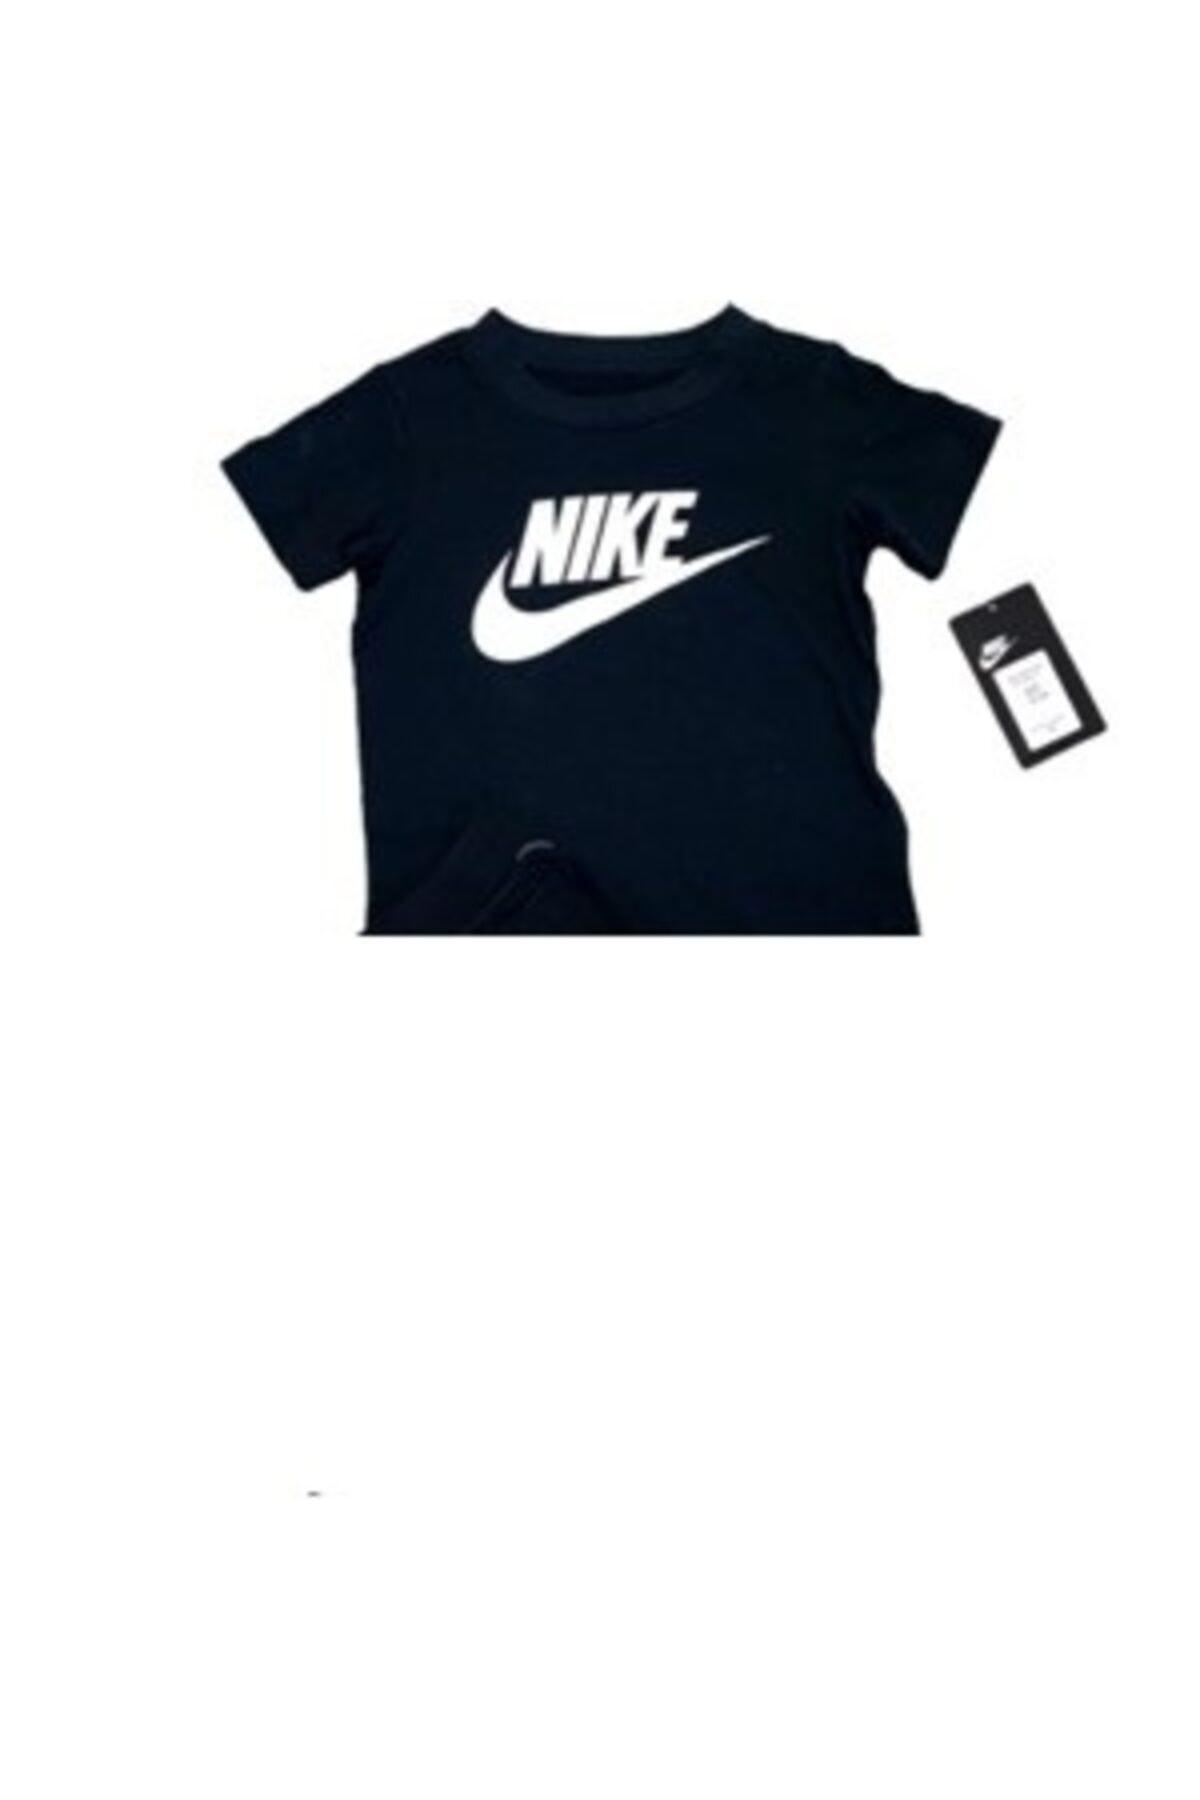 Nike Nkb Futura S/s Tee (Tişört) 1